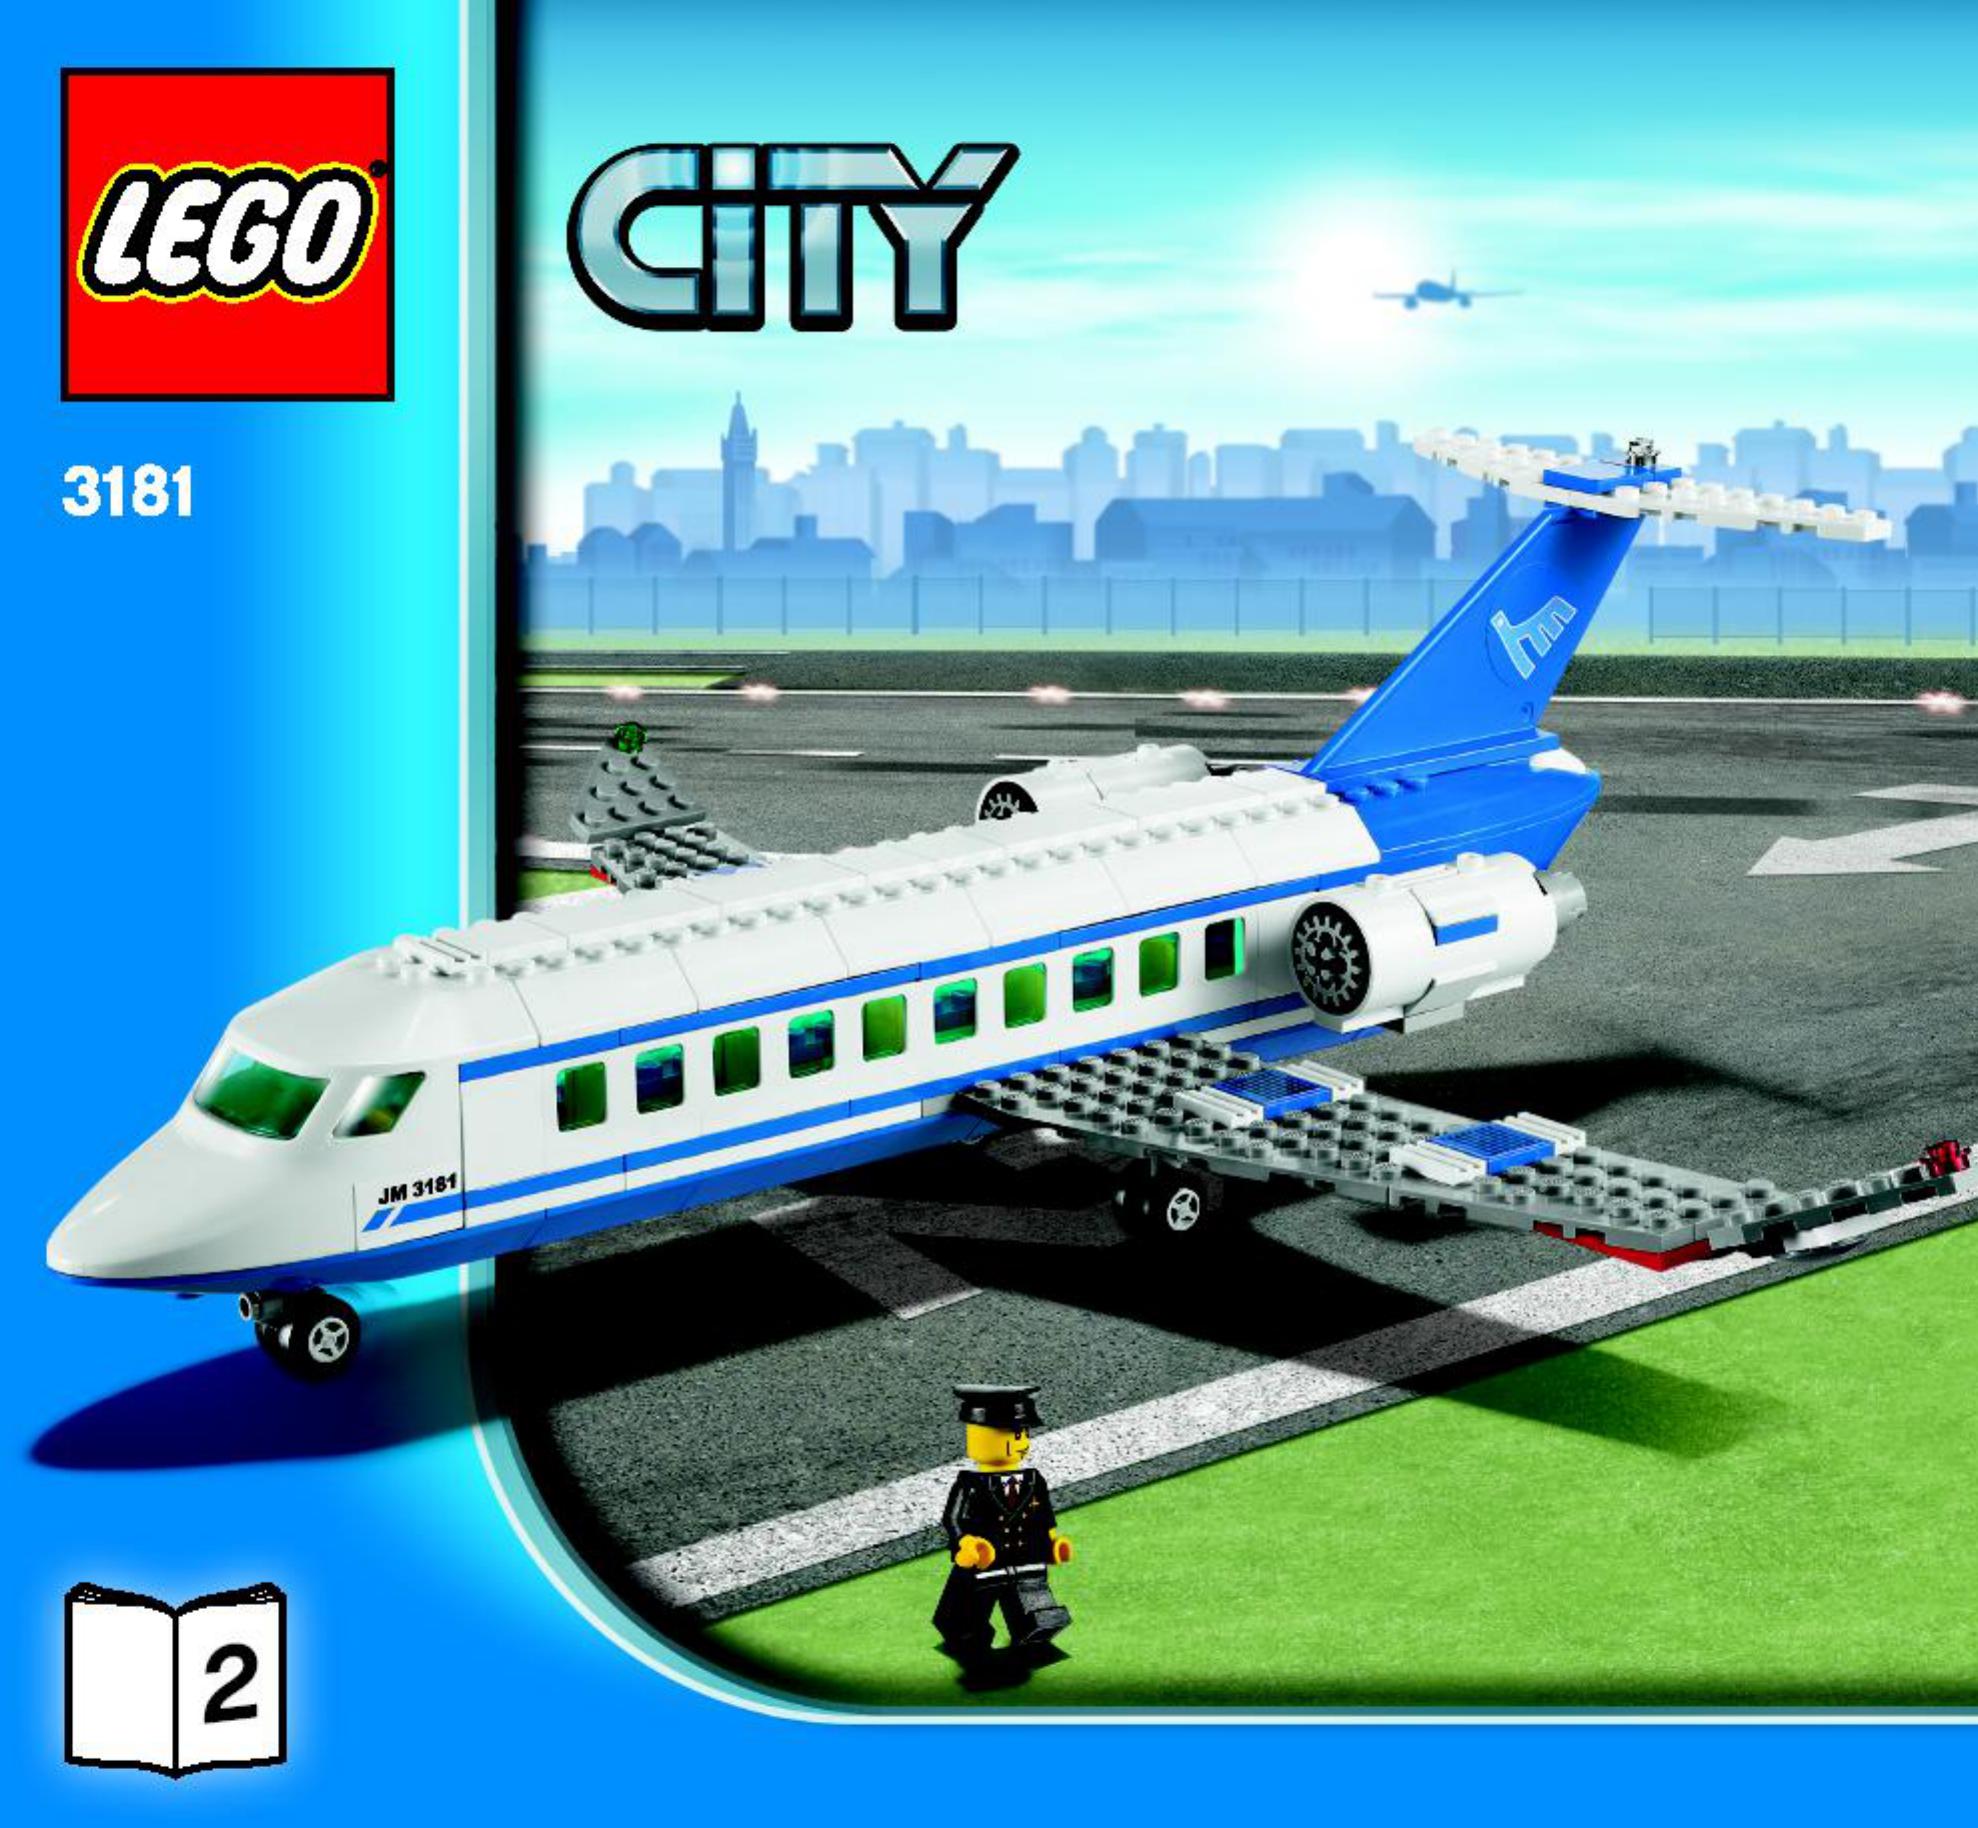 Lego City Airport Passenger Plane 3181 Handleiding Kids Lego